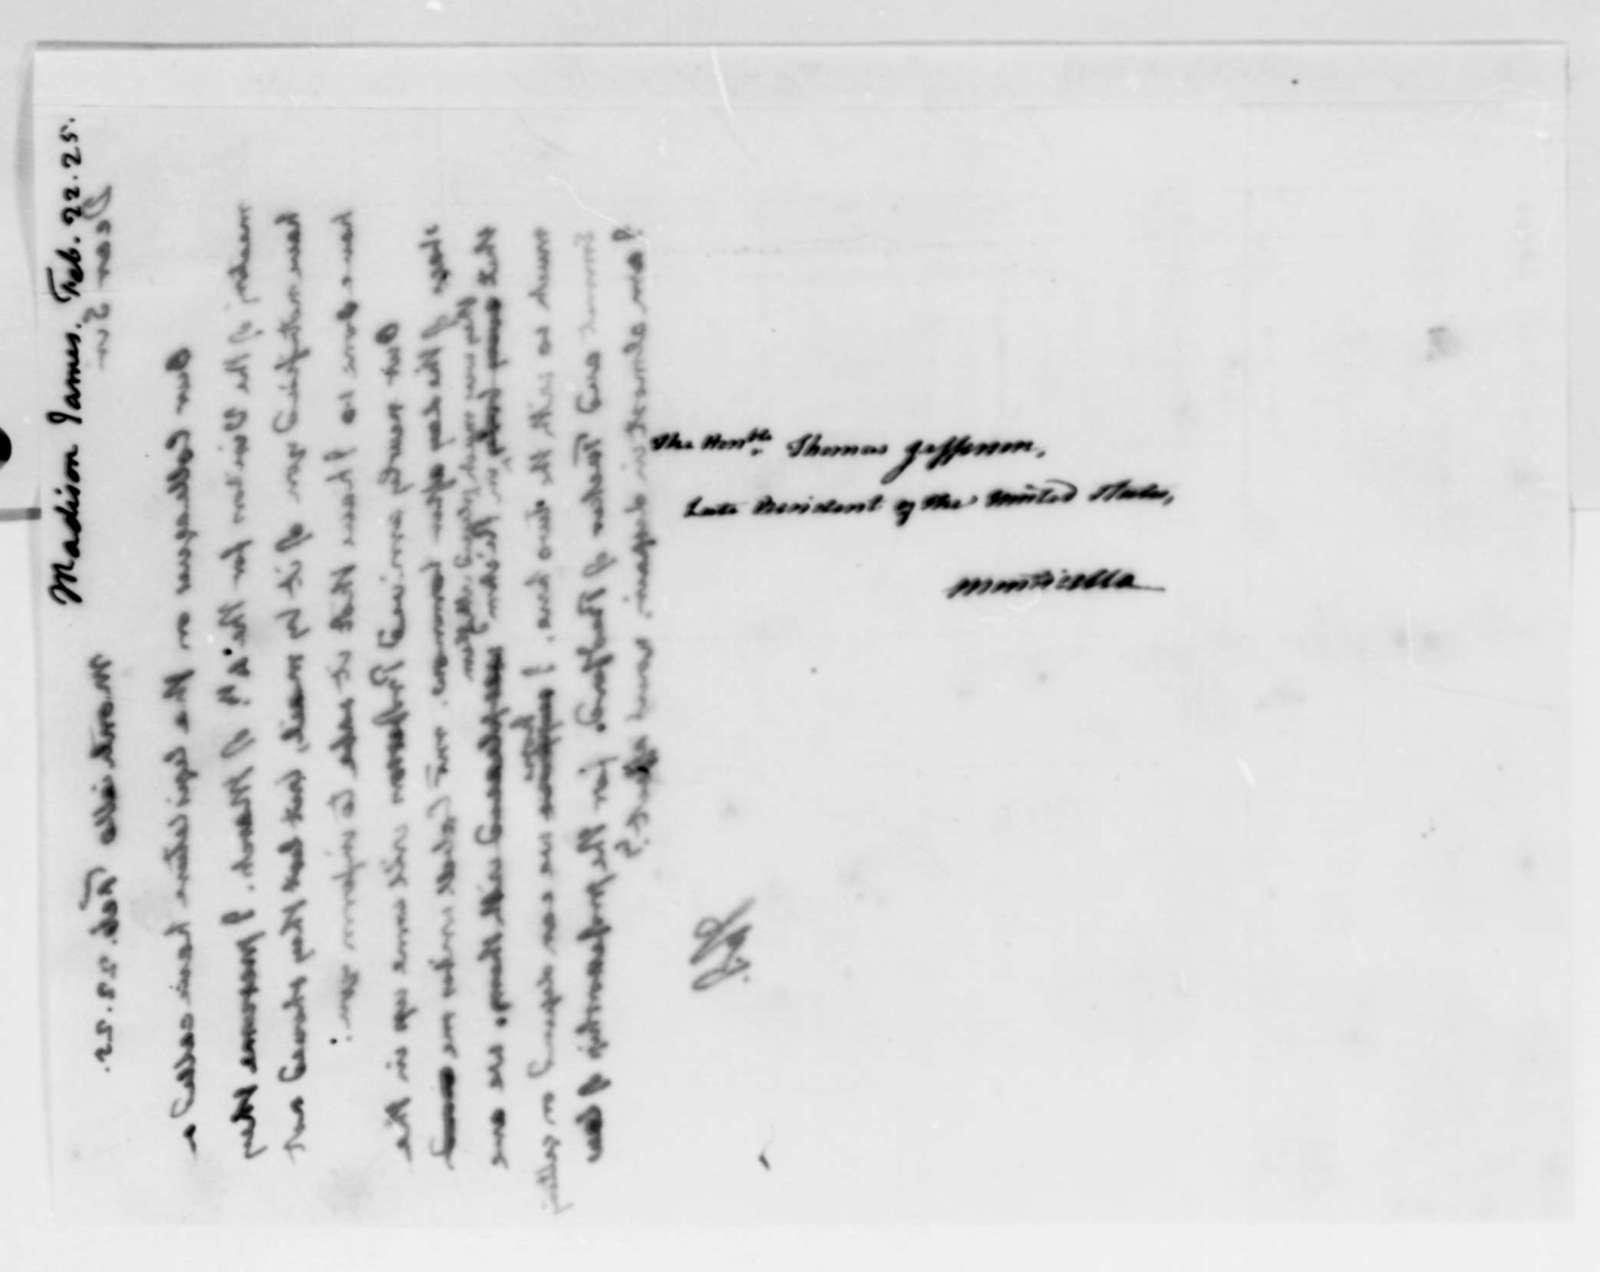 Thomas Jefferson to James Madison, February 22, 1825